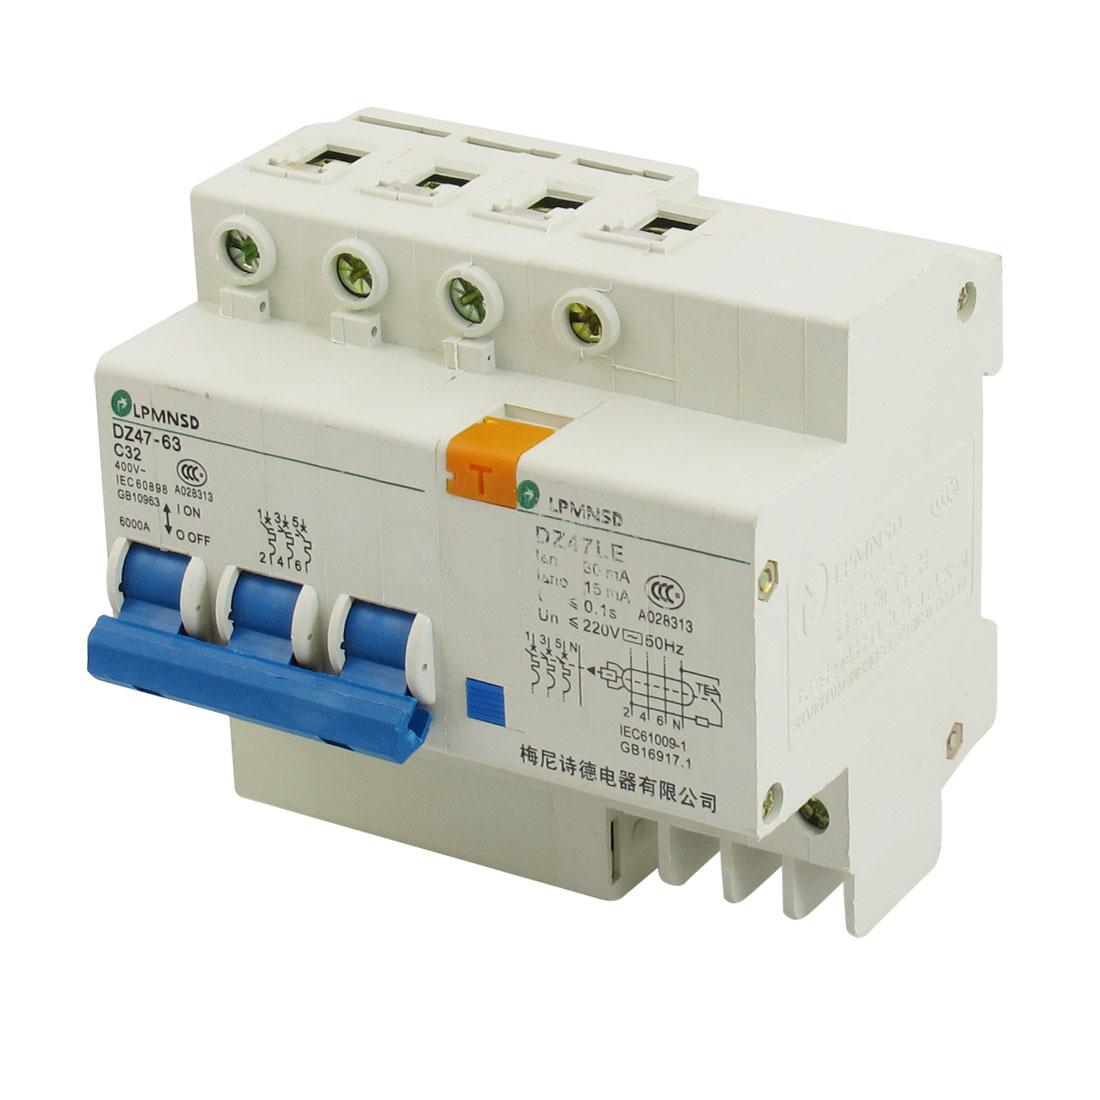 DZ47-63 DZ47LE 32A 400VAC 6000A 3 Pole Mini ELCB Earth Leakage Circuit Breaker